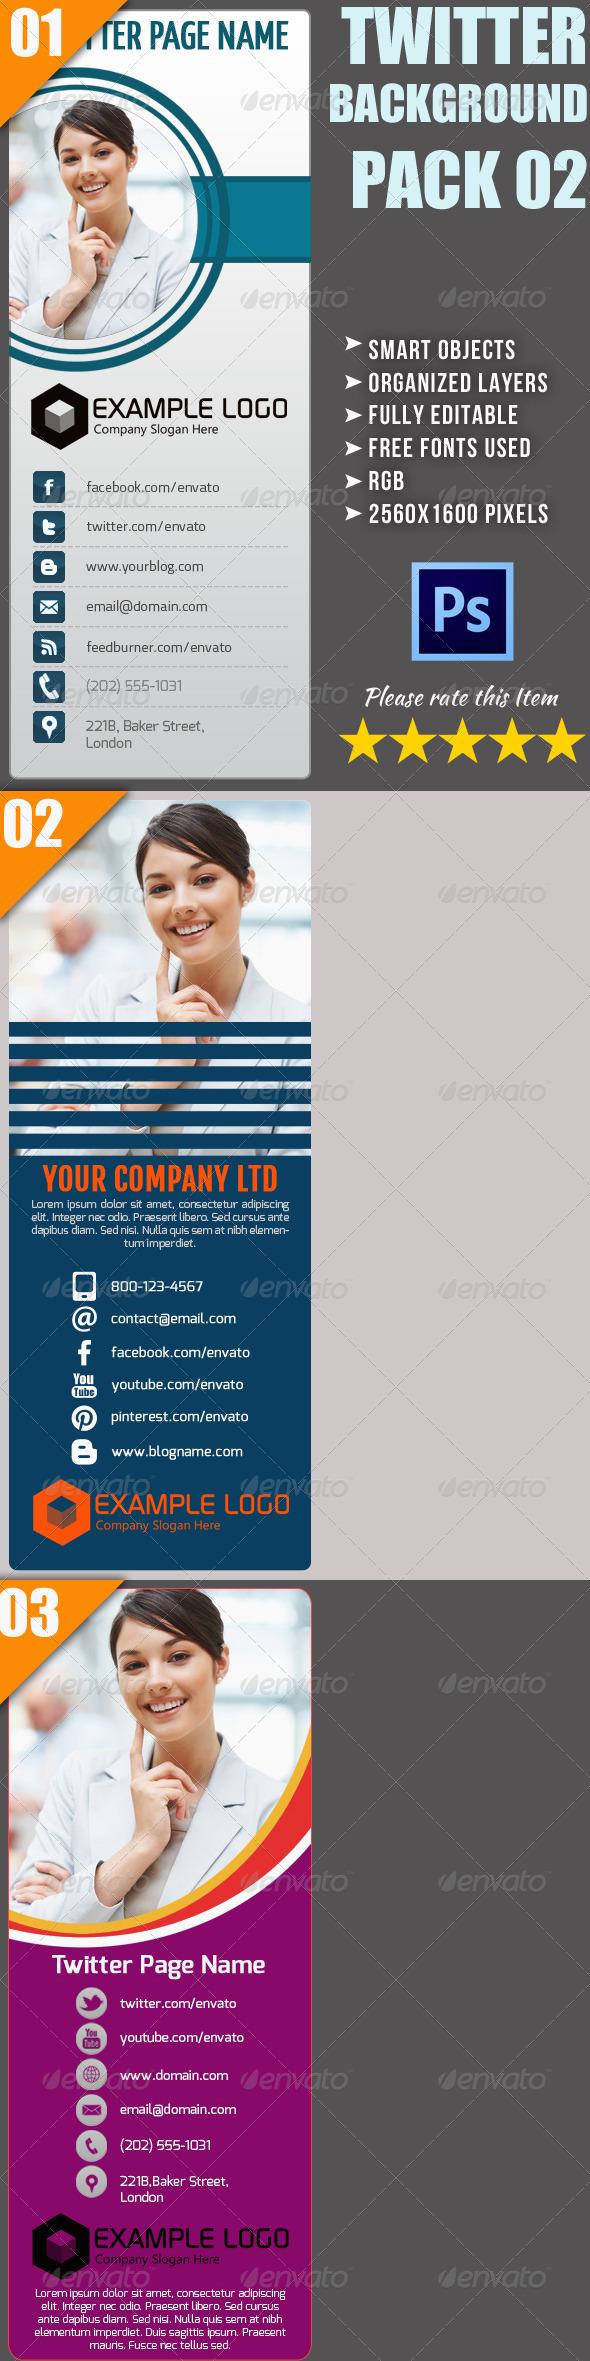 Corporate Twitter Background Bundle 02 - Twitter Social Media